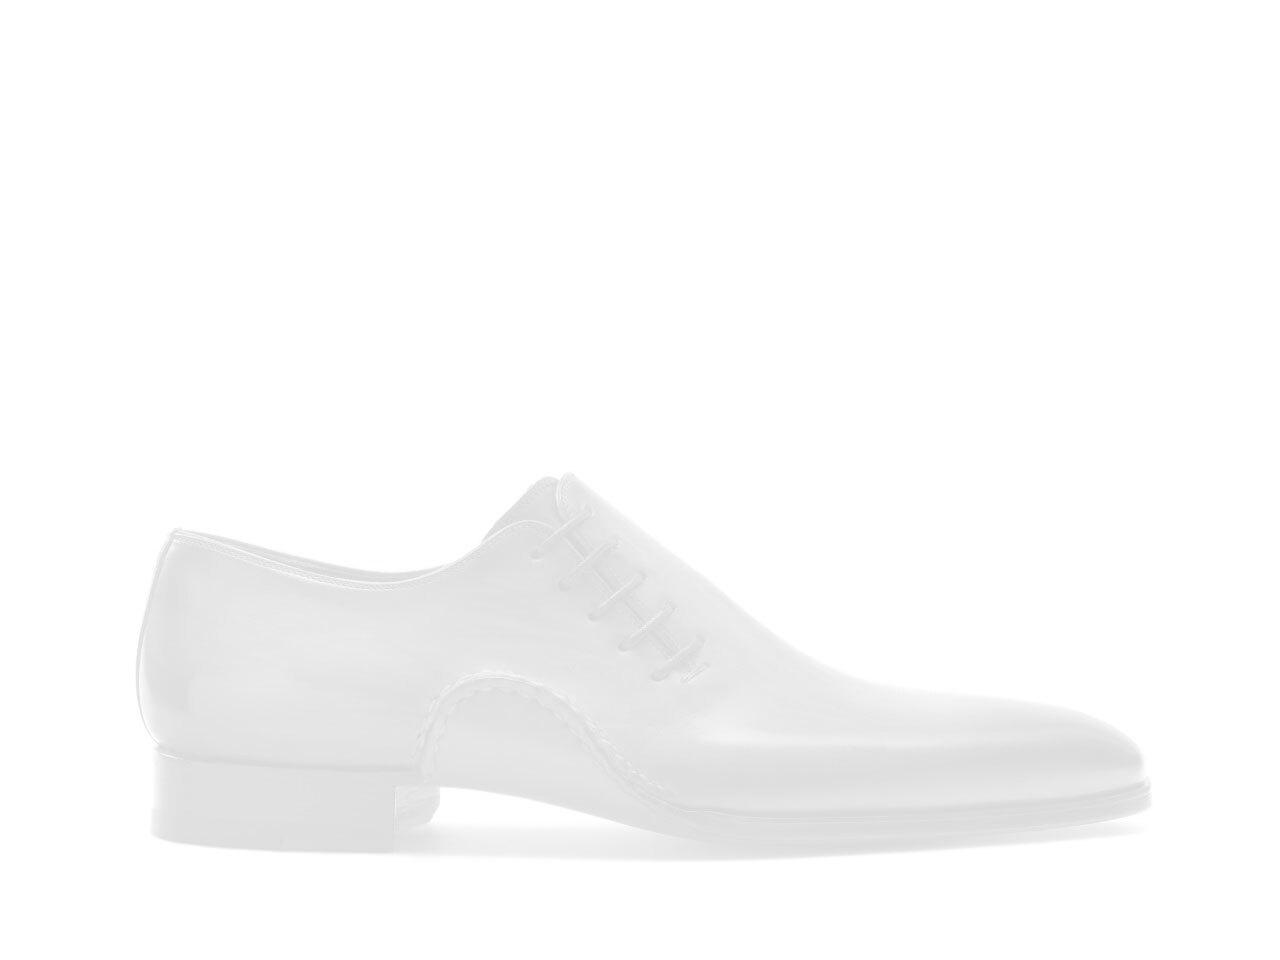 Pair of the Magnanni Warwick Grey Men's Sneakers